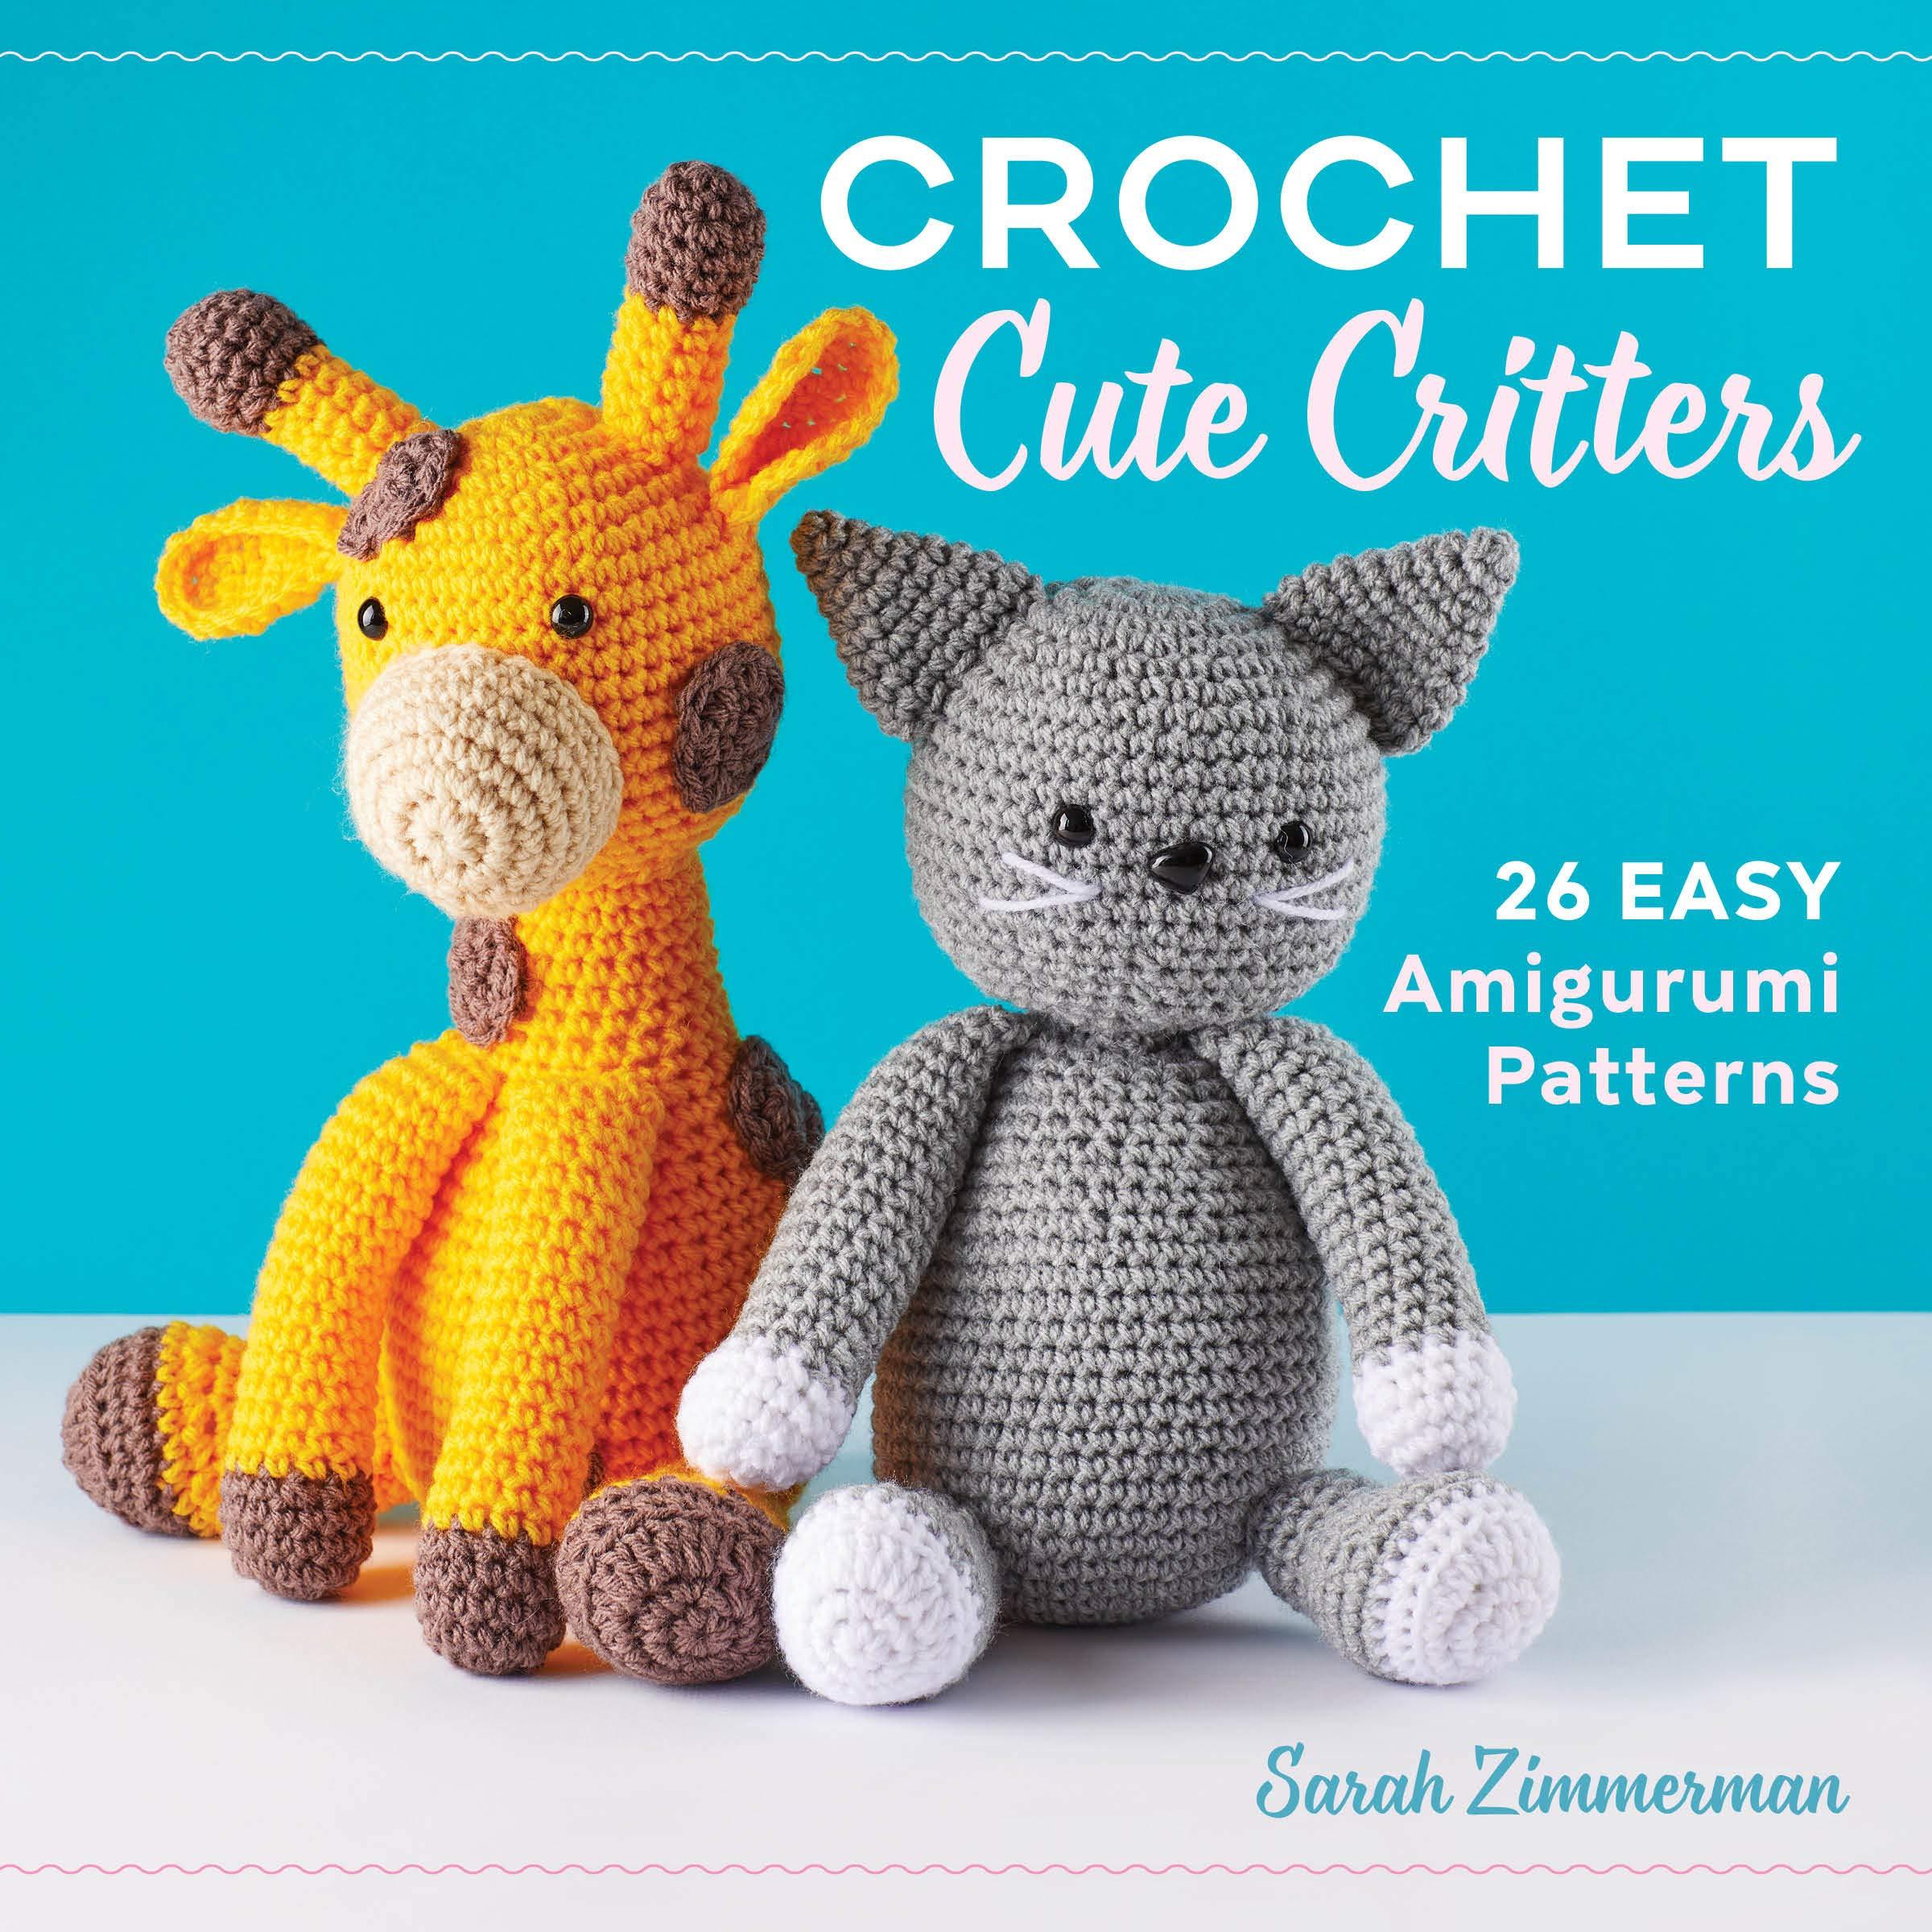 Crochet Cute Critters Amigurumi Patterns product image